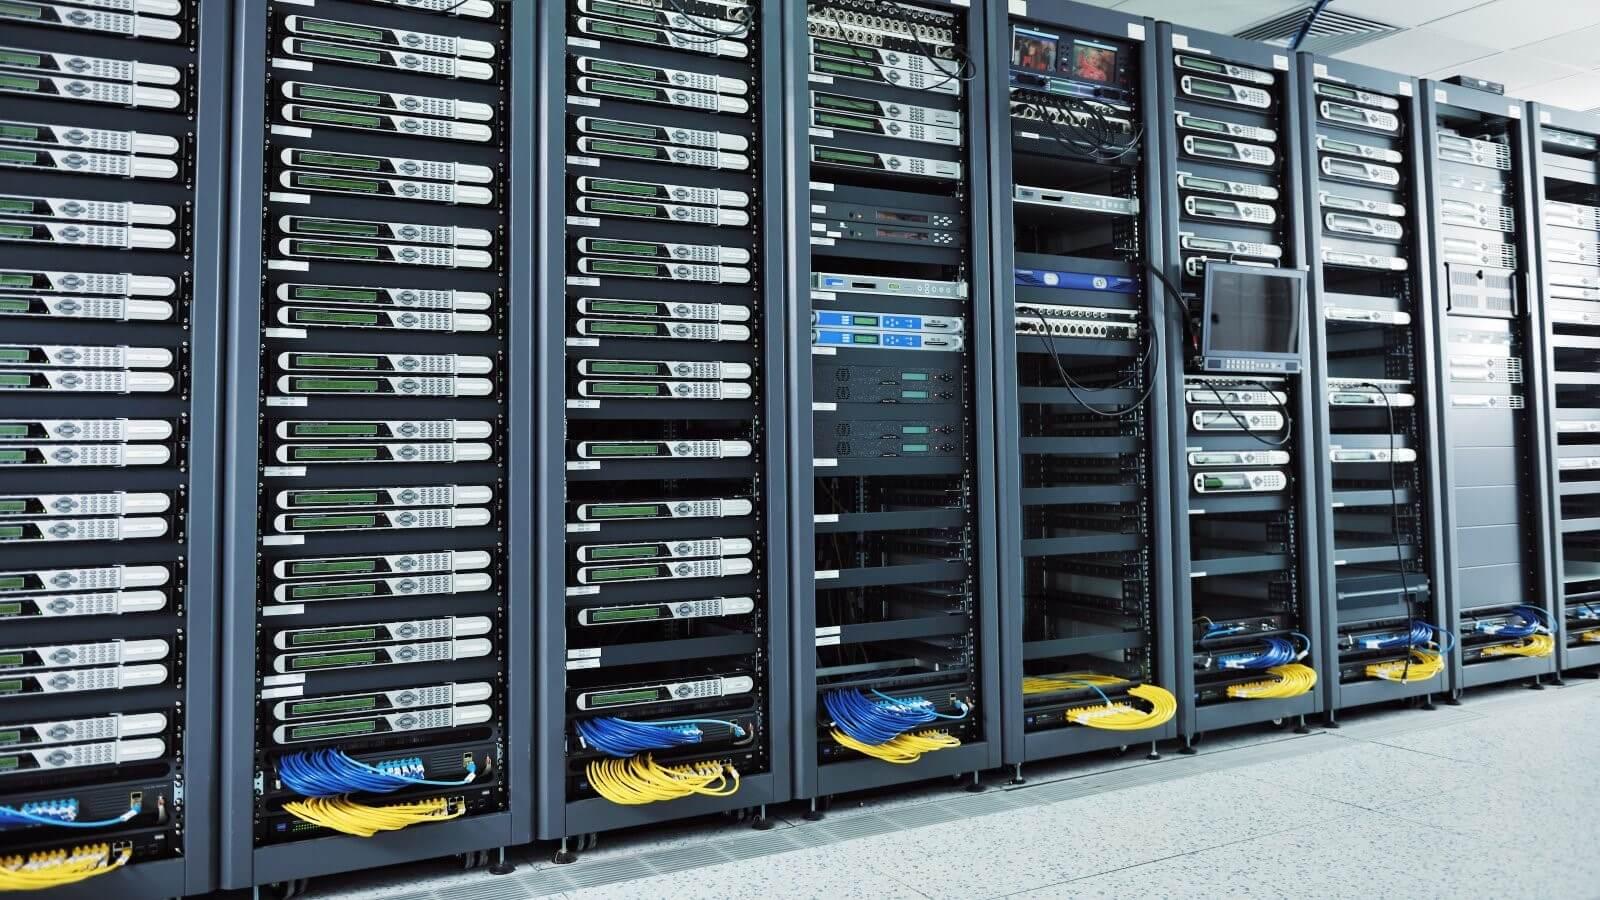 dedicated server patch